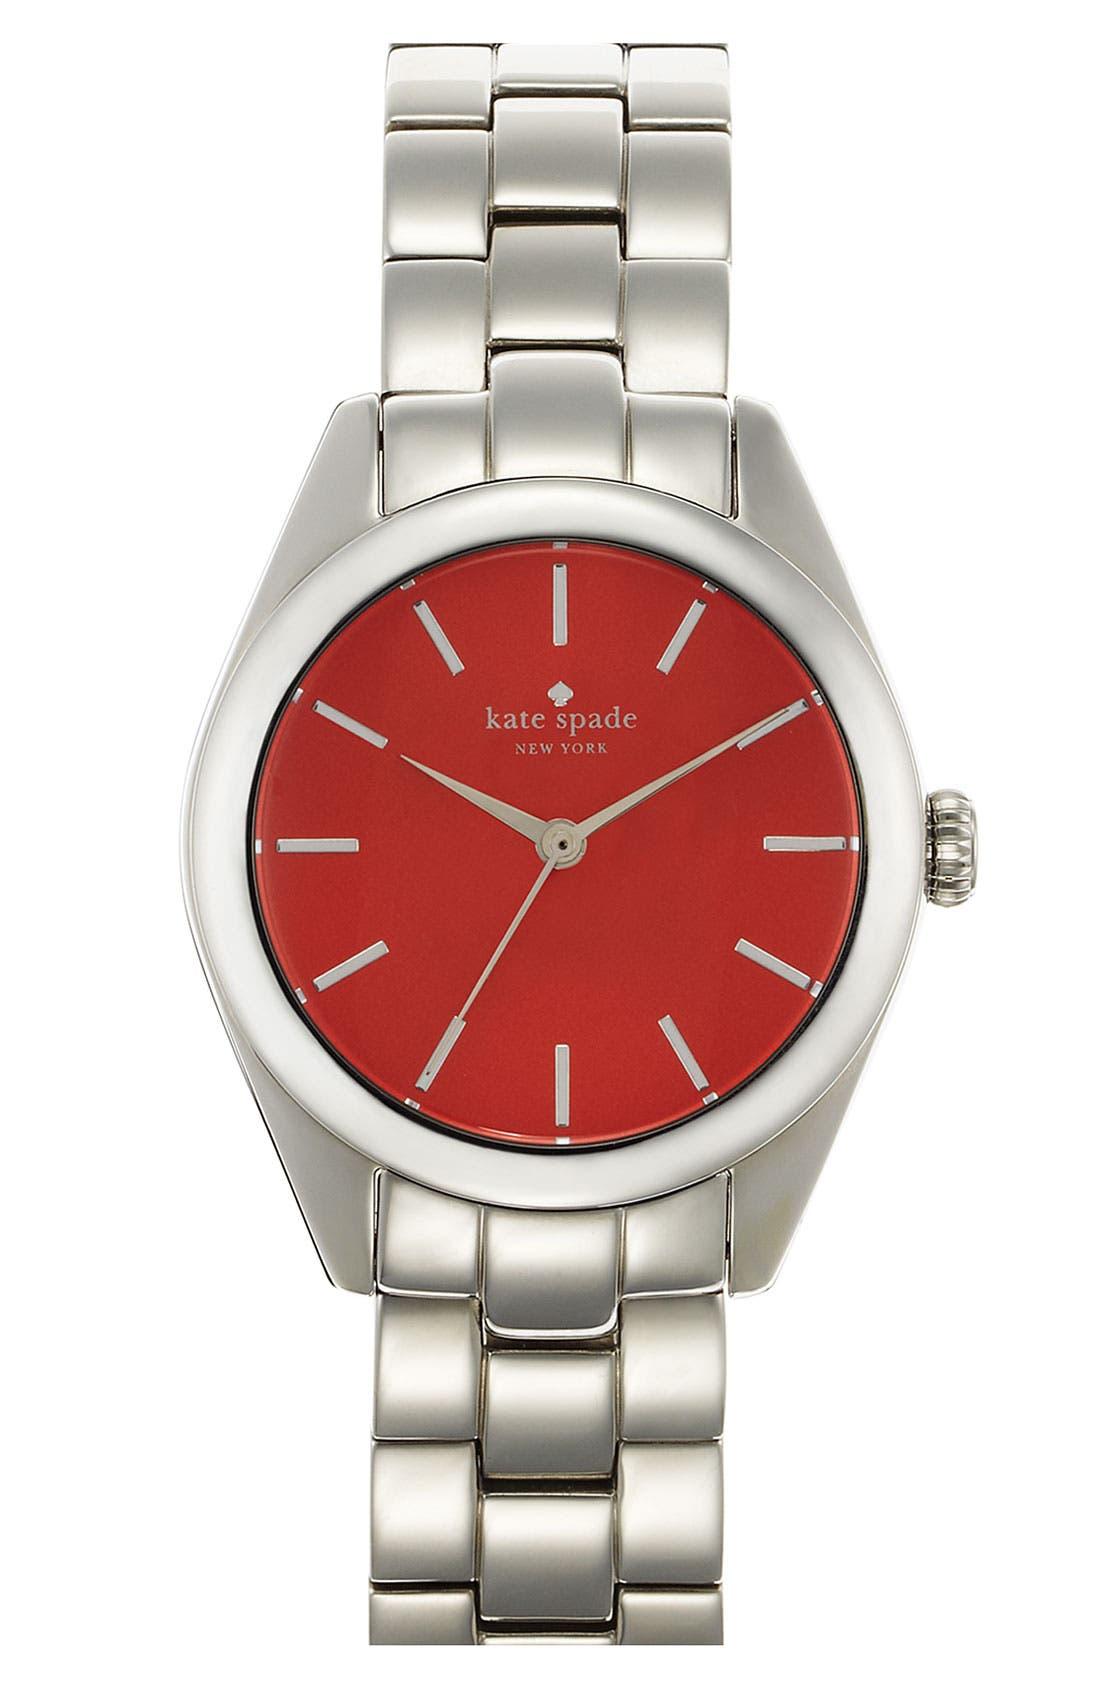 Main Image - kate spade new york 'seaport' bracelet watch